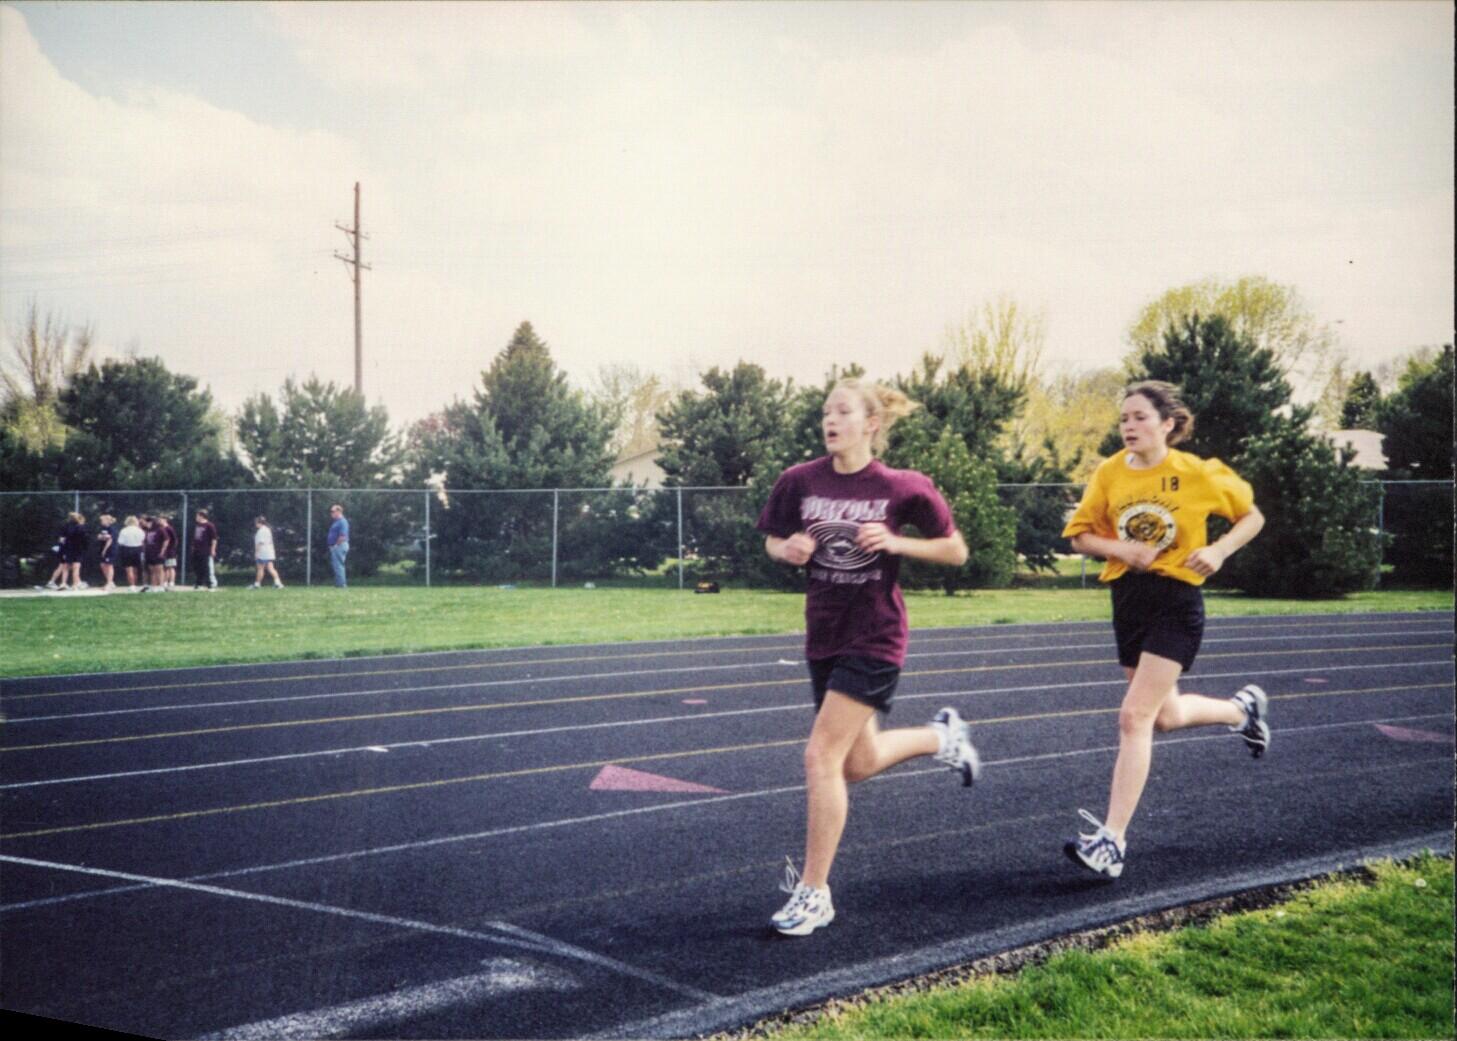 Middle school mile